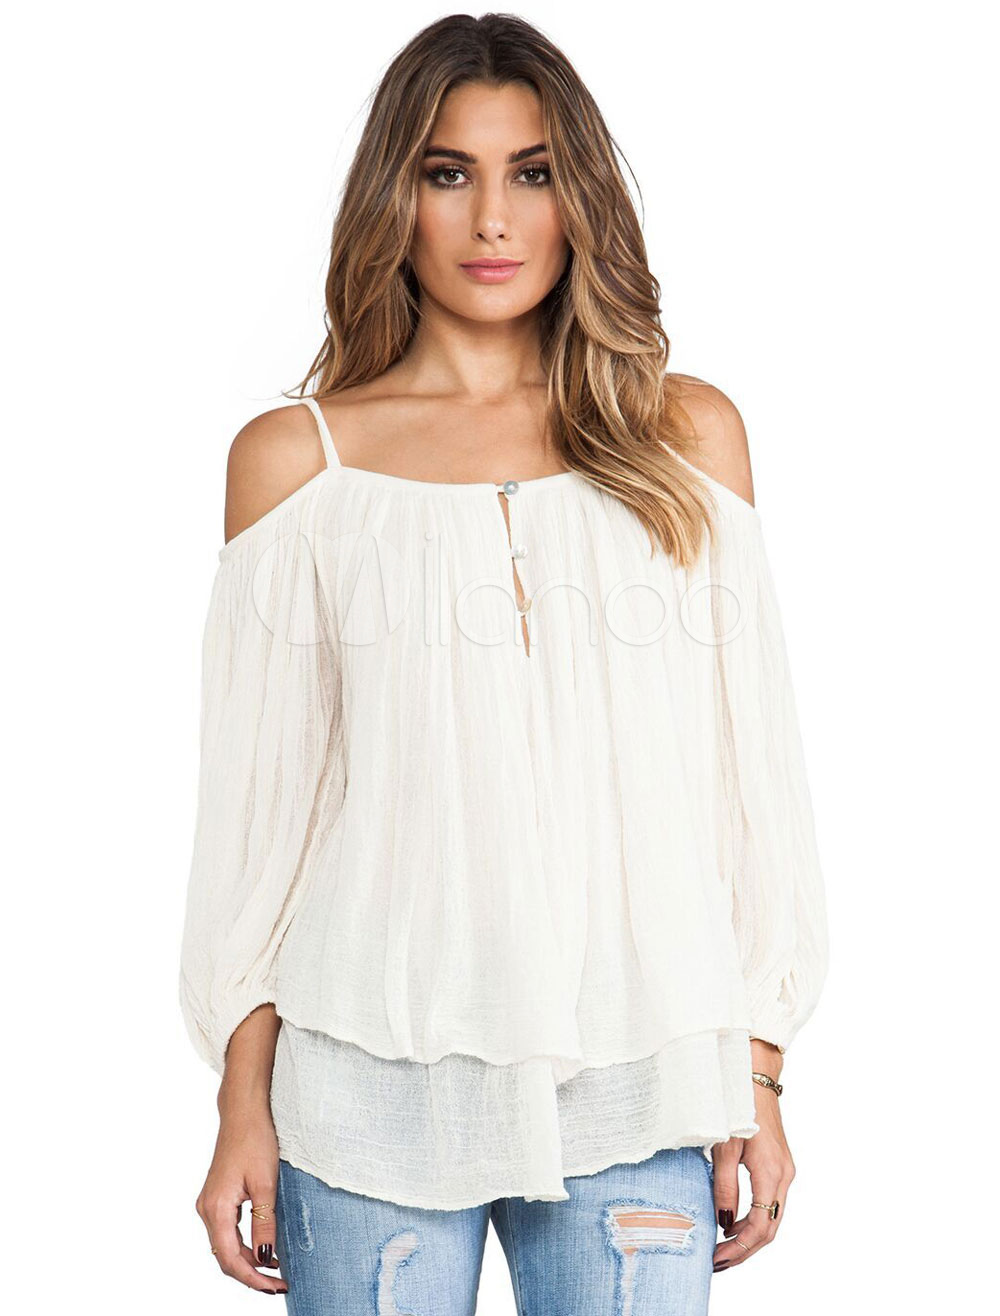 44fd82691c277e ... White Linen Blouse Spaghetti Straps 3 4 Length Sleeve Buttons Decor  Cold Shoulder Chic Top. 1. 35%OFF. Color White